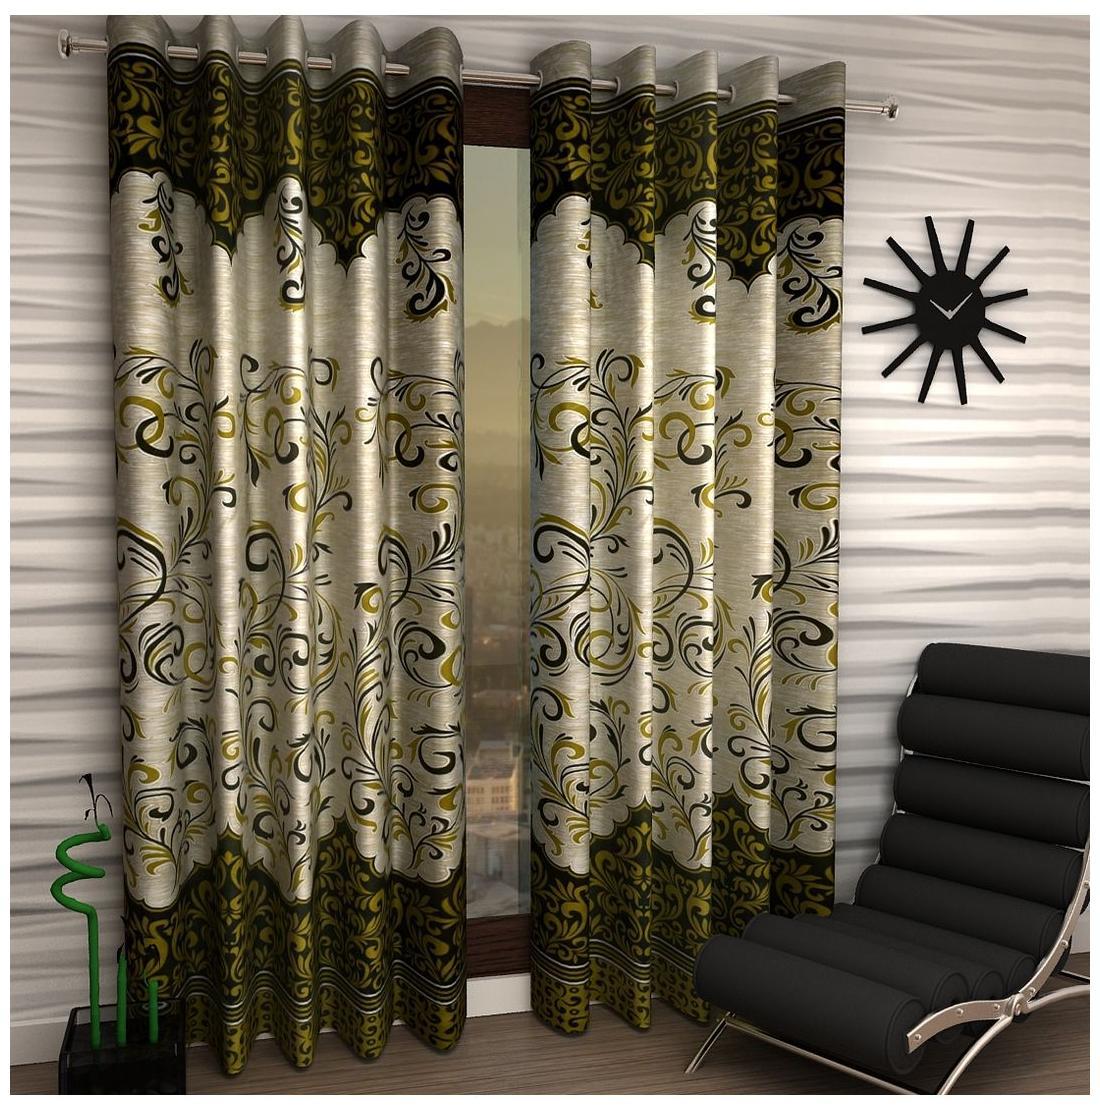 living room curtains for sale half wall tiles design buy door window kitchen online at home sizzler set of 2